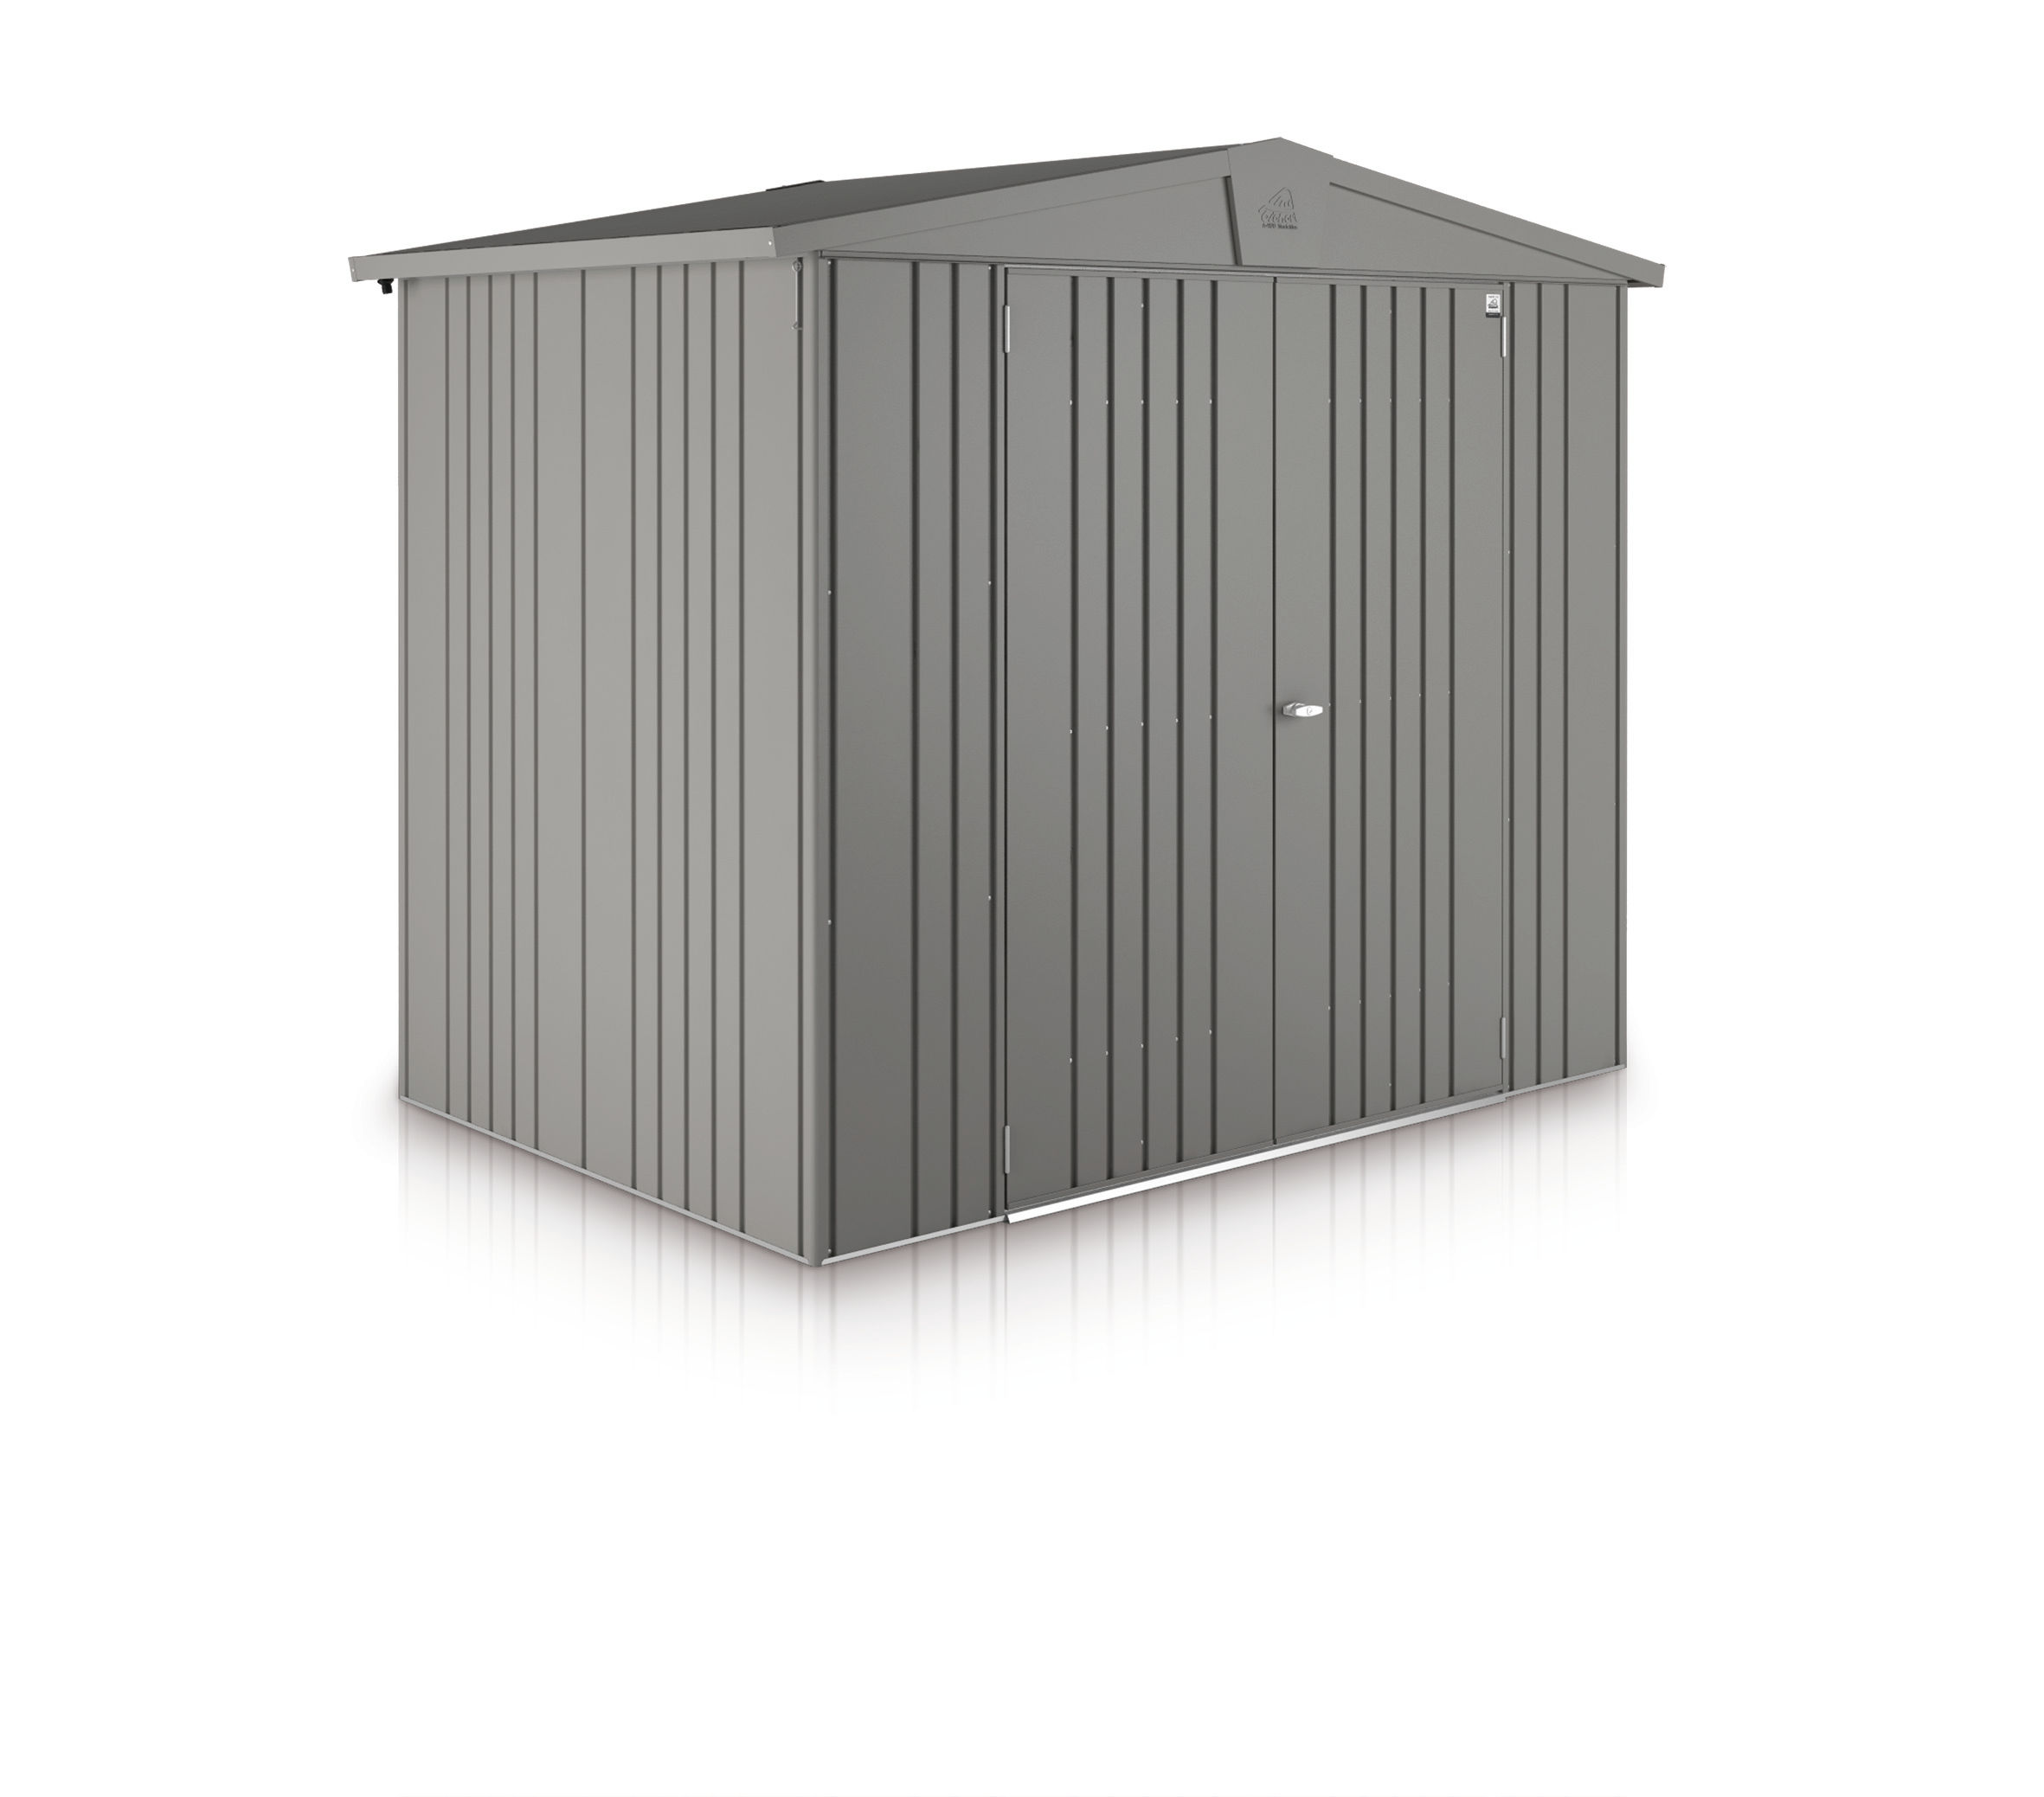 ger tehaus europa silber metallic 4a 29090. Black Bedroom Furniture Sets. Home Design Ideas